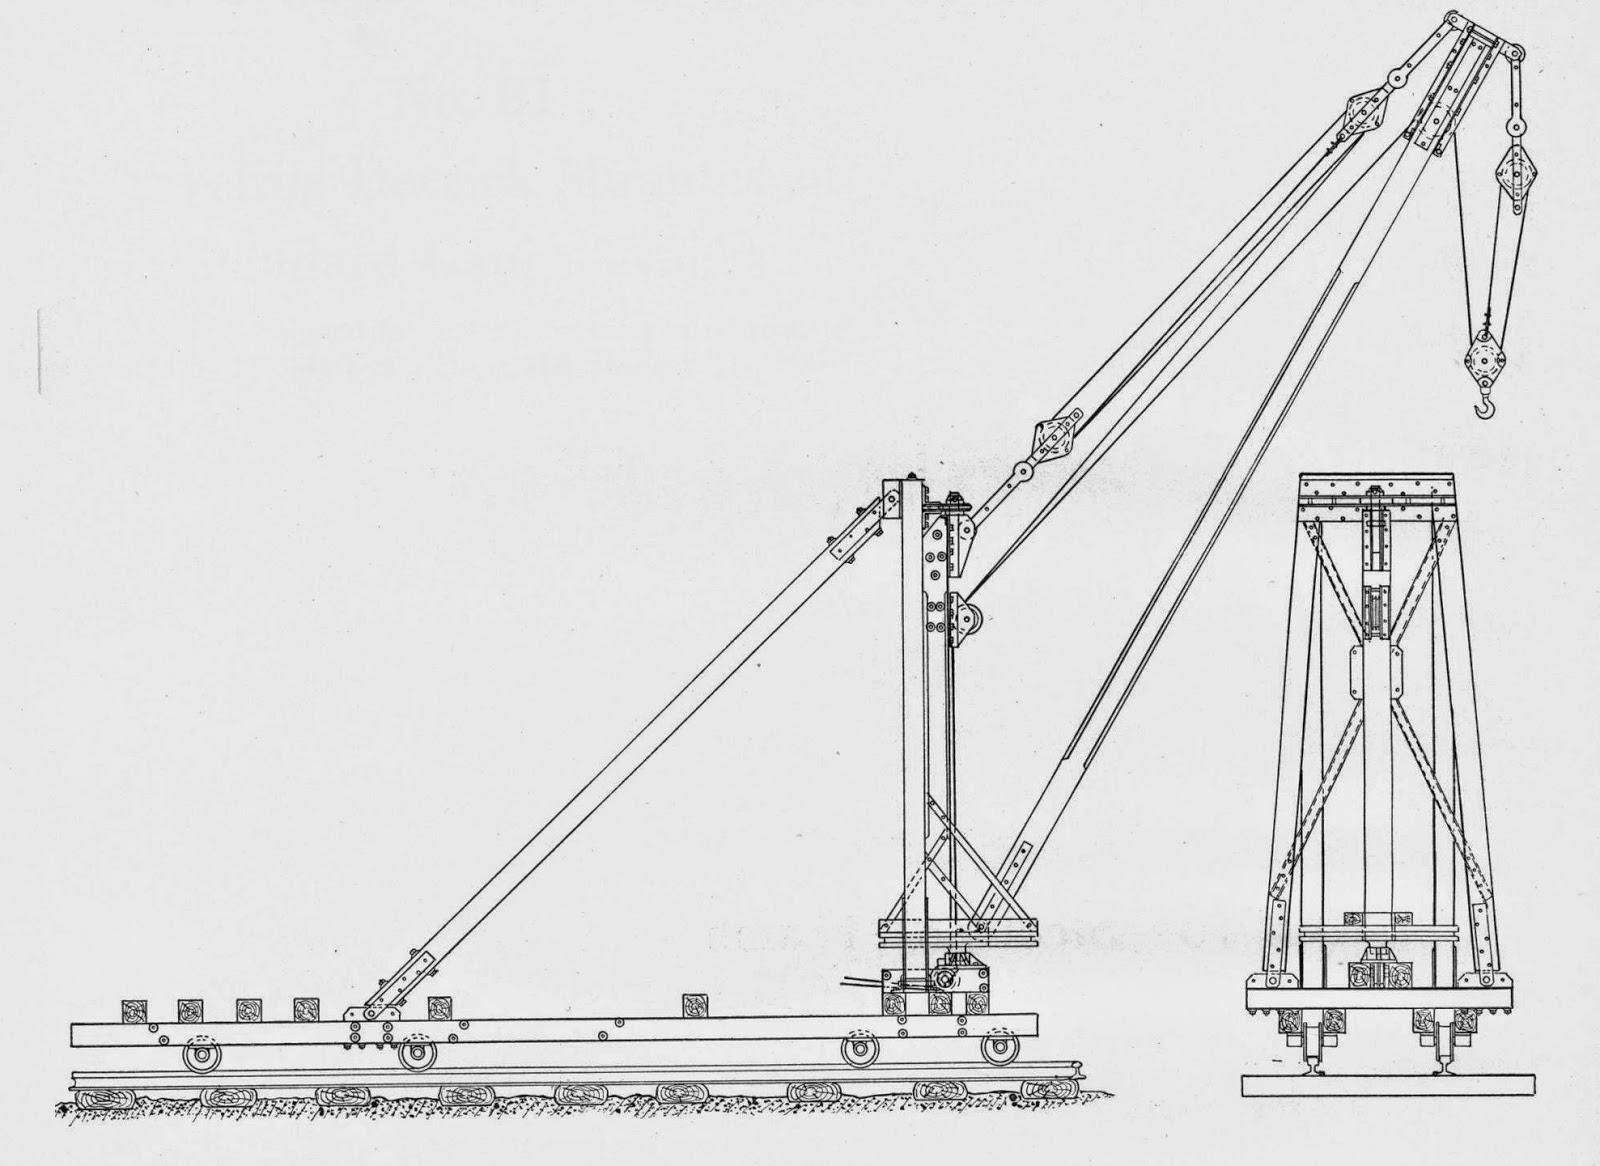 Model Railroad Minutiae April